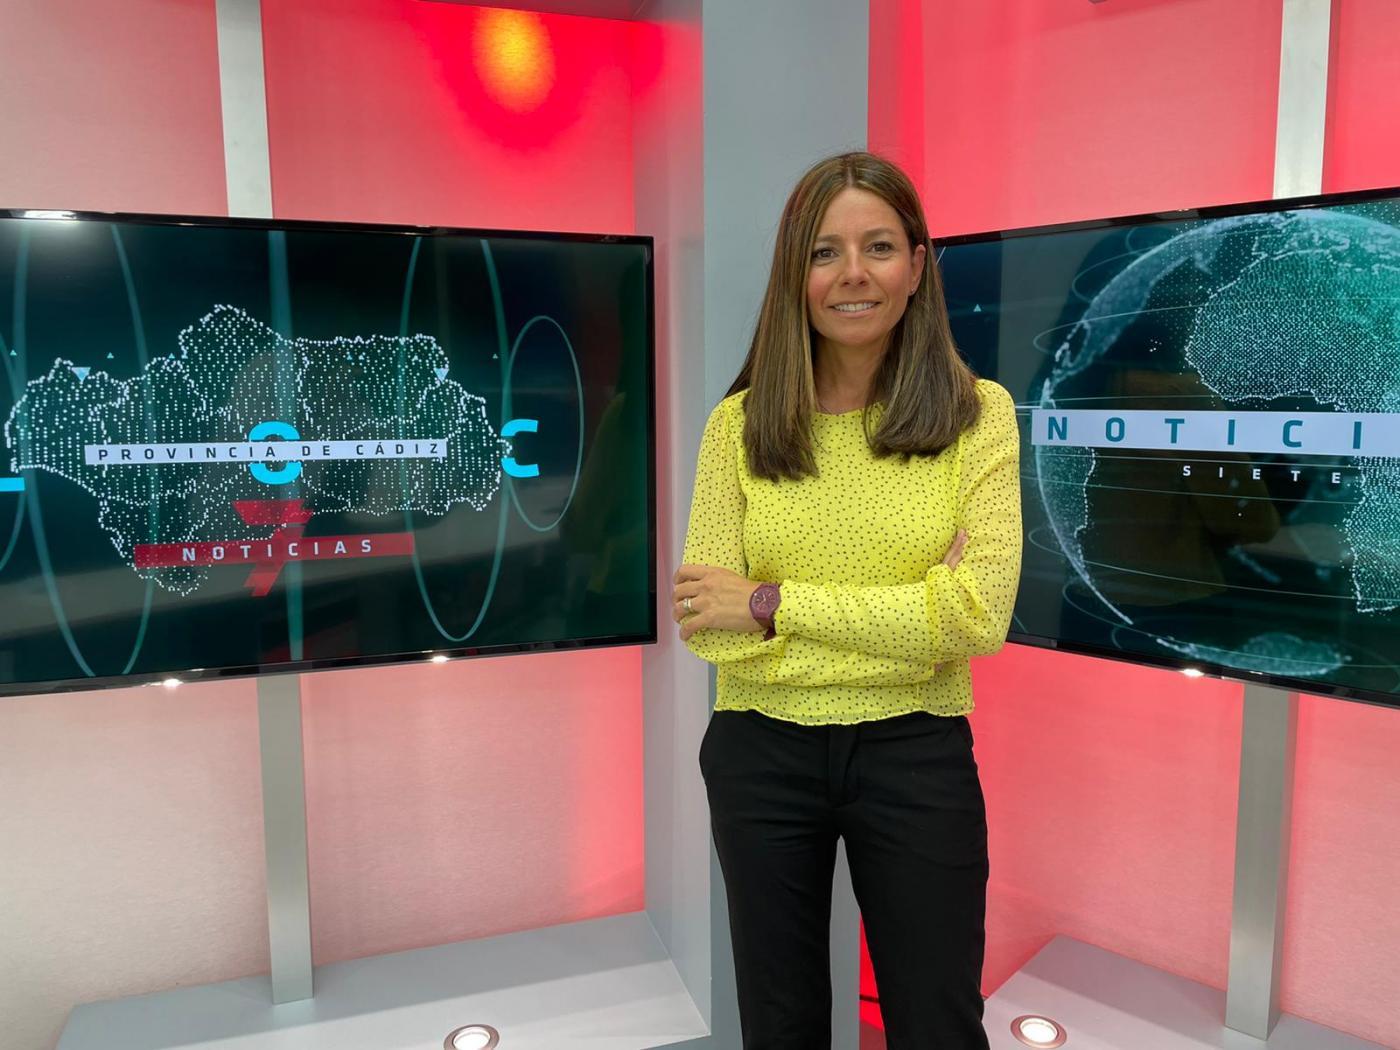 Ana Huguet, al frente del informativo de la provincia de Cádiz